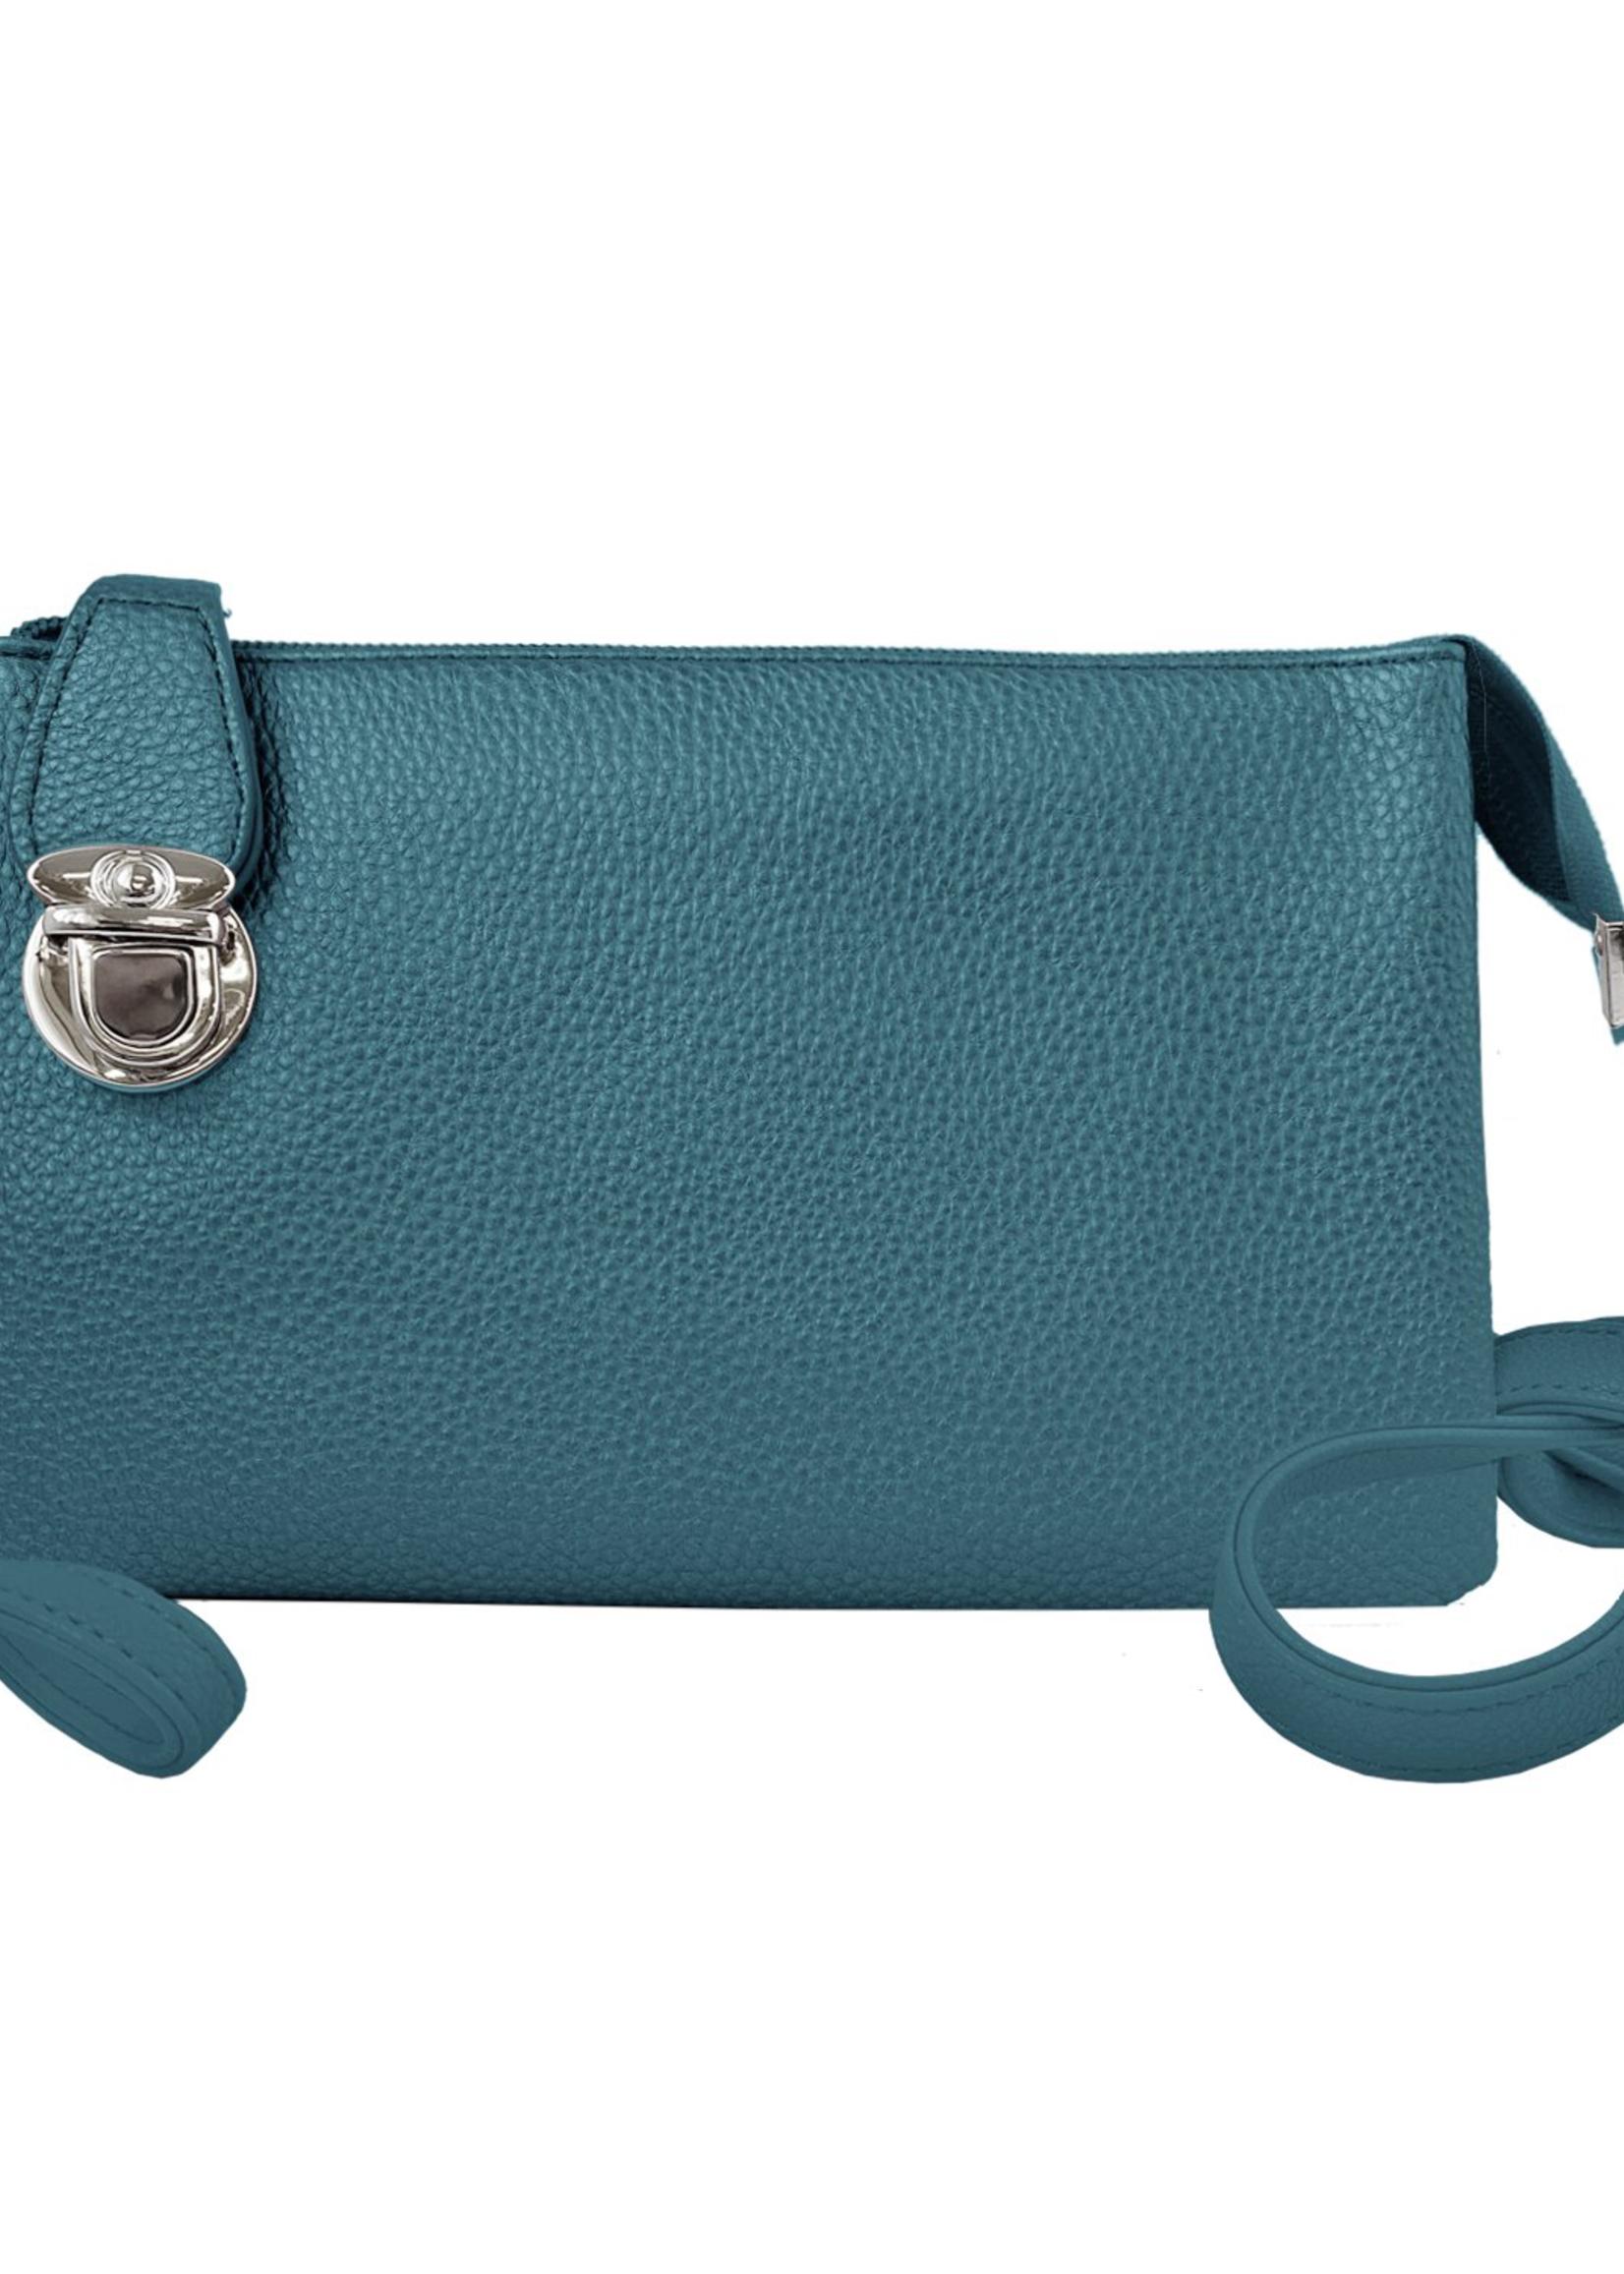 Caracol Caracol XBody Bag Multi Pocket TEAL